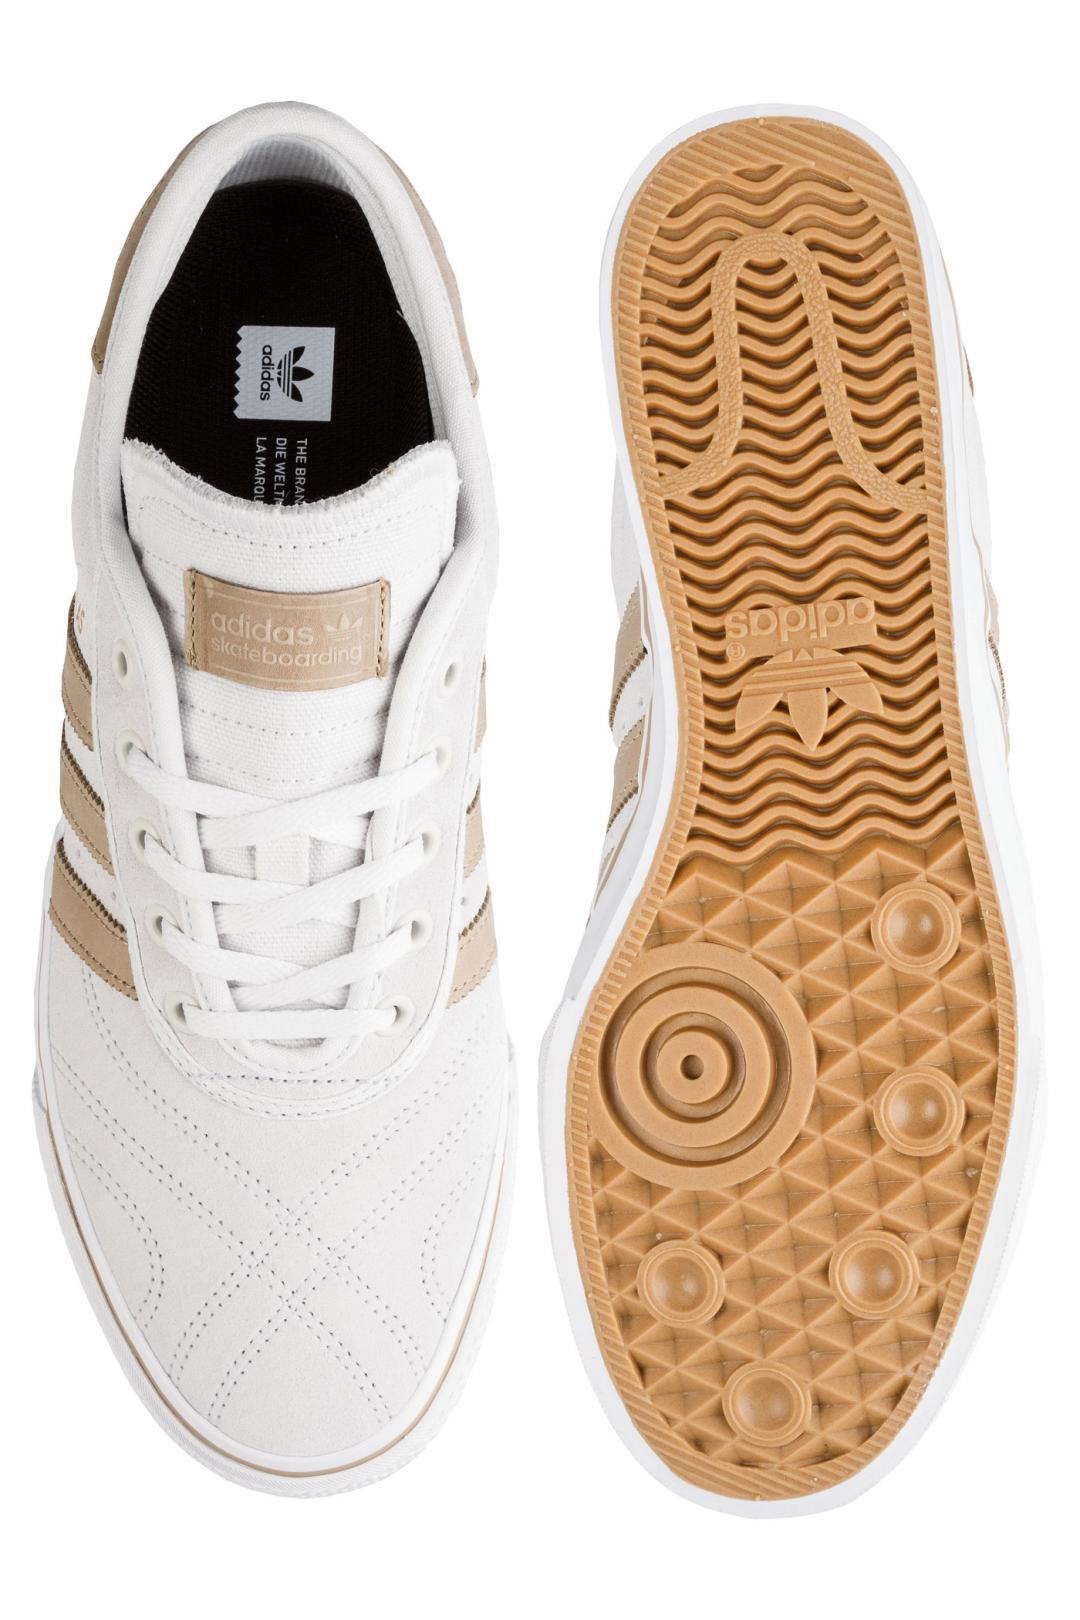 Uomo adidas Skateboarding Adi Ease Premiere white hemp white   Scarpe da skate